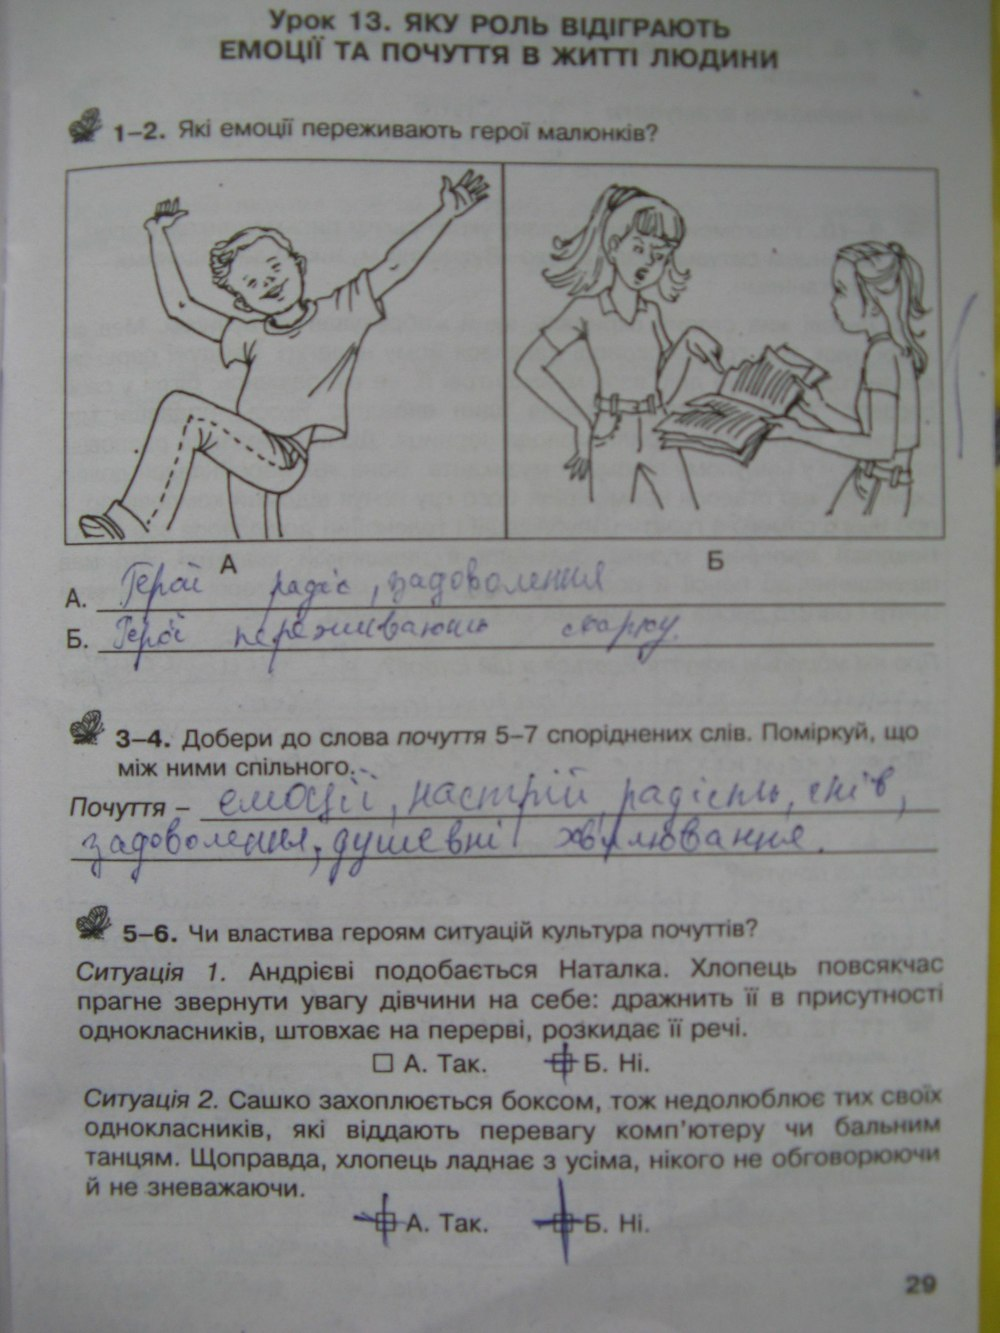 Гдз друкований зошит з етики 6 клас